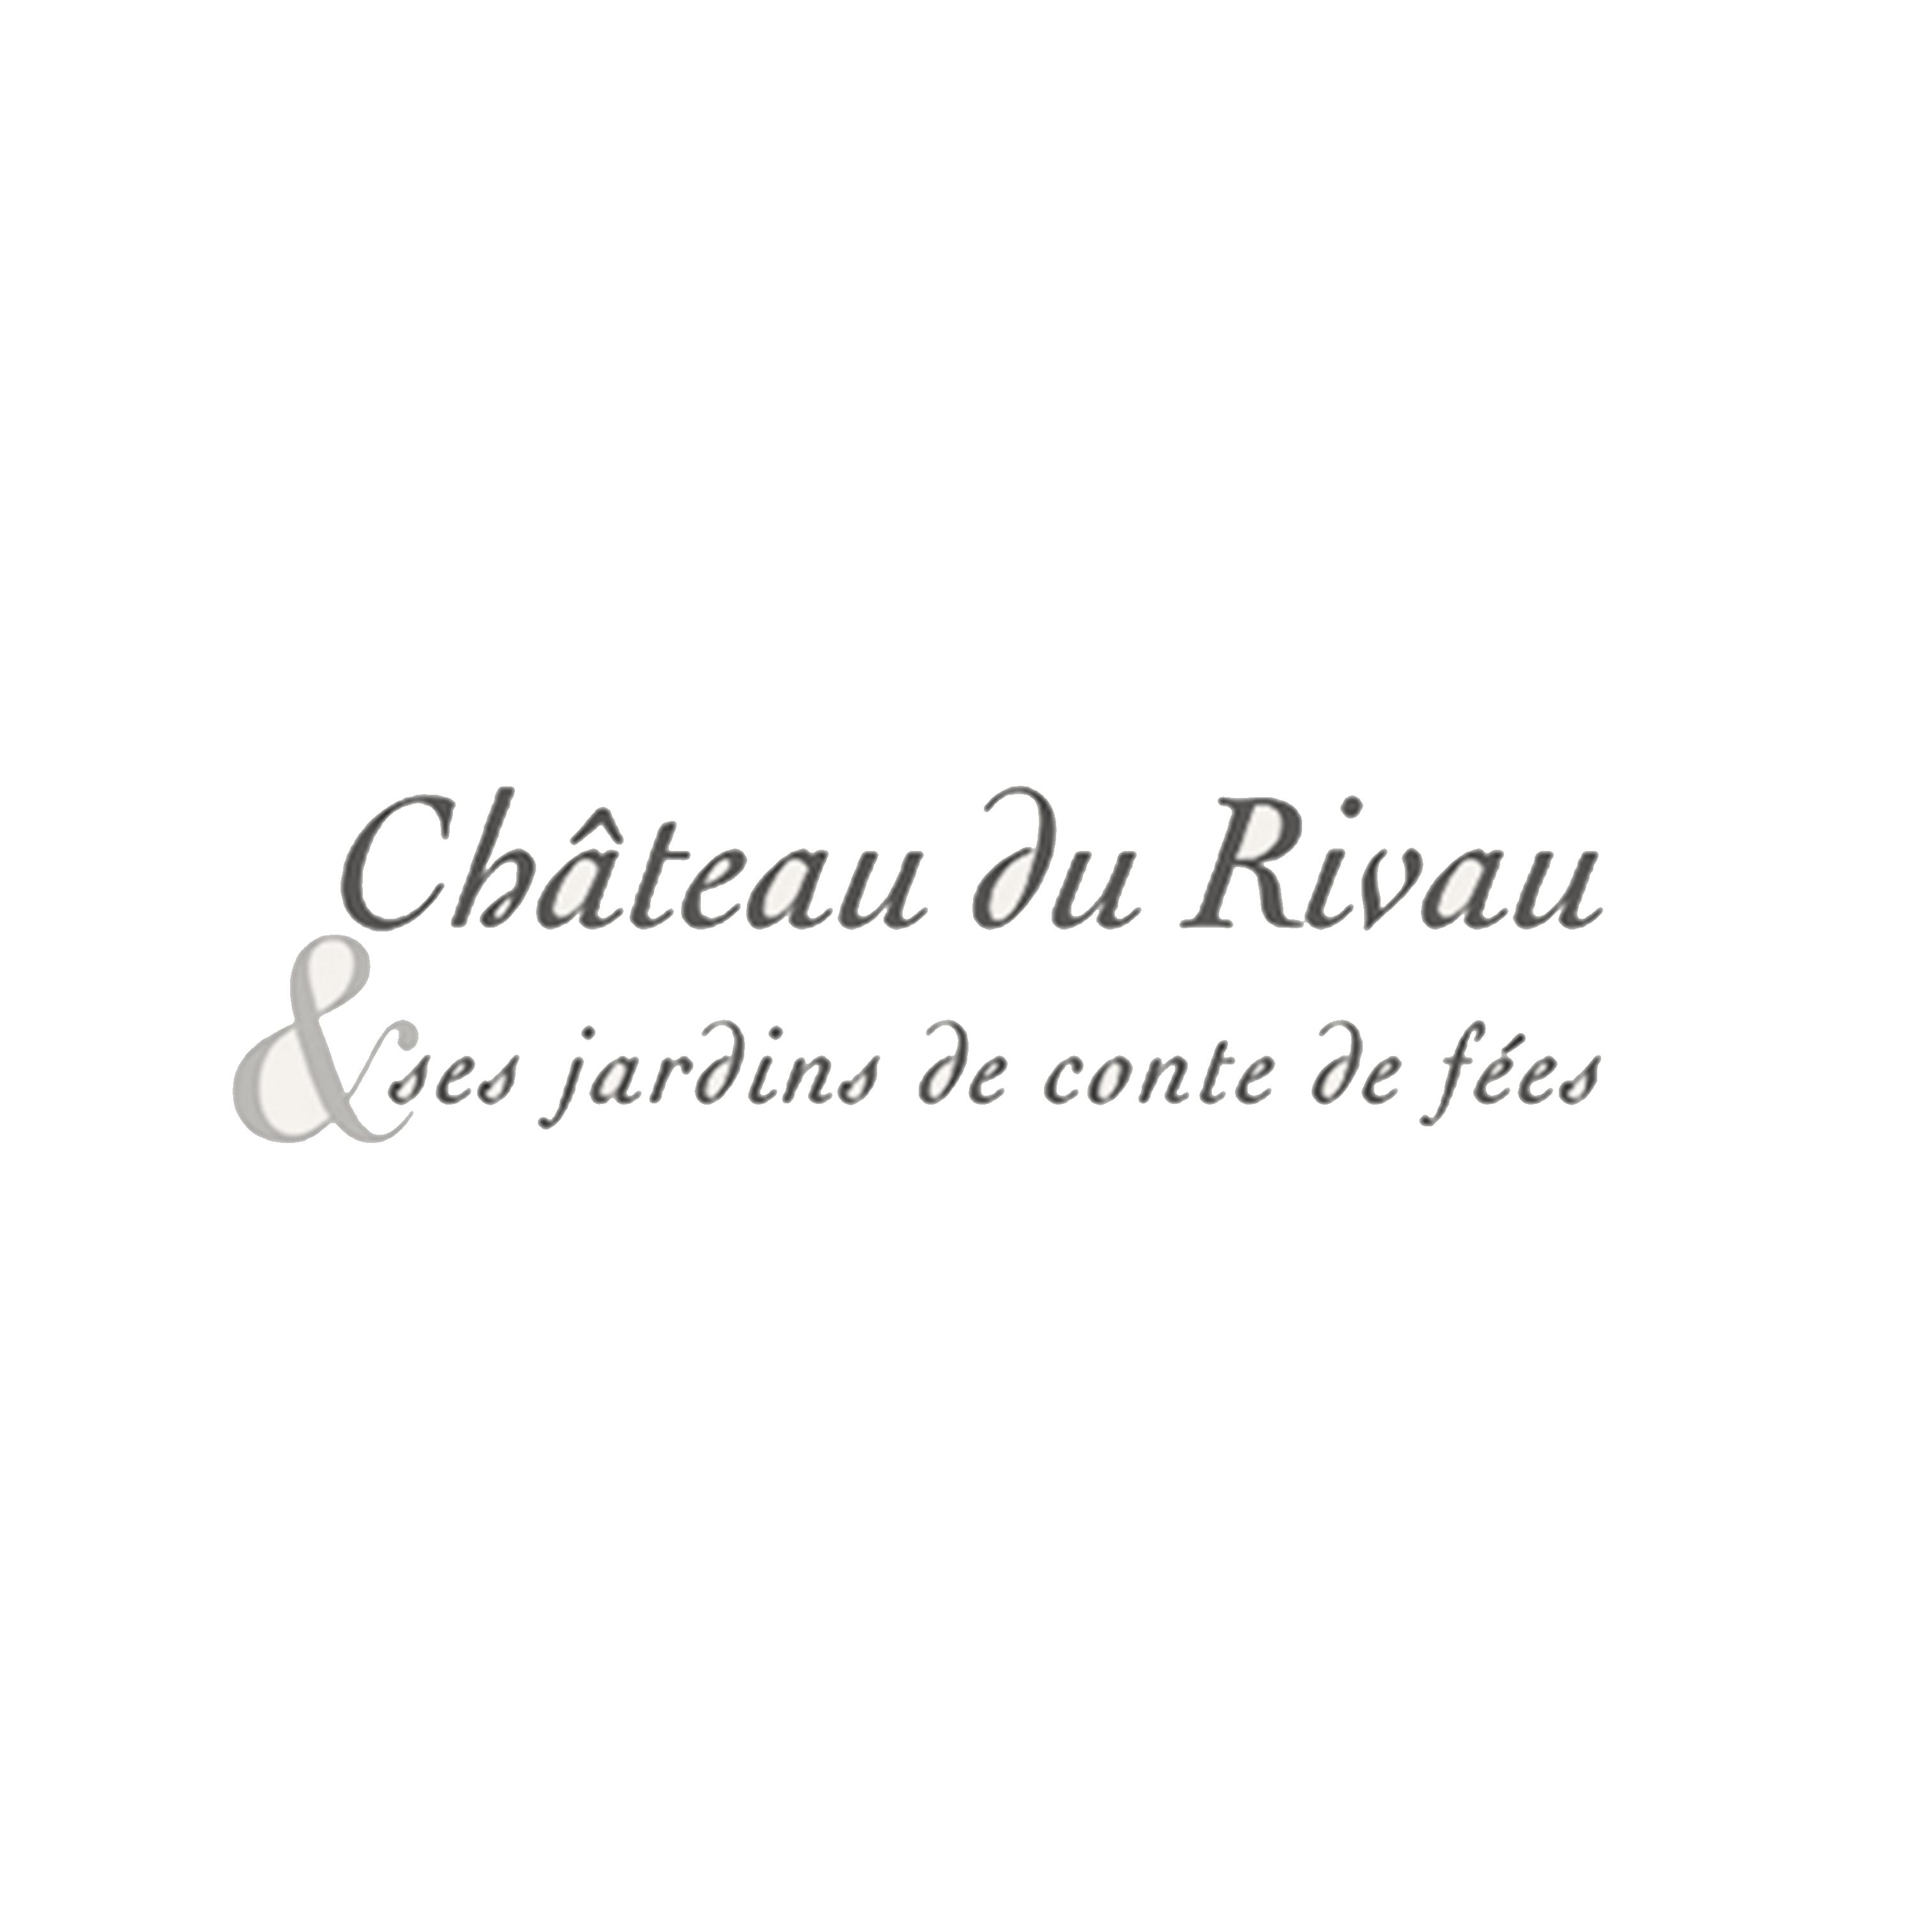 chateau-du-rivau-logo